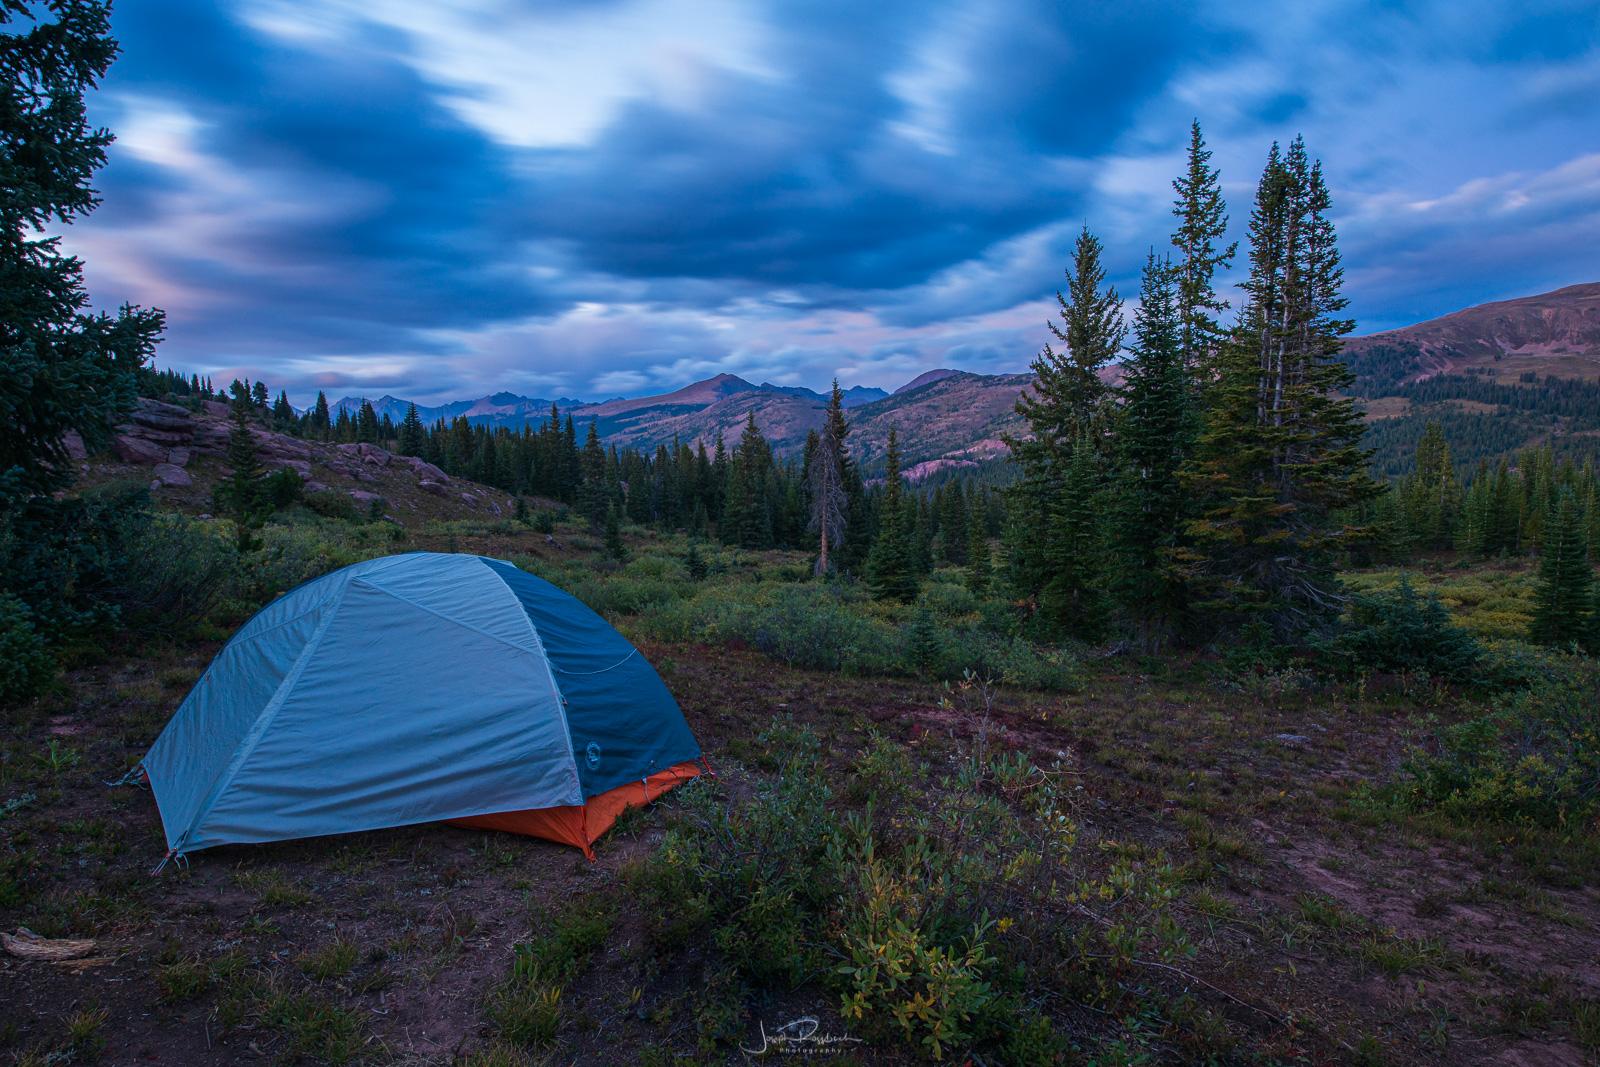 Campsite at twilight from Shrine Ridge.